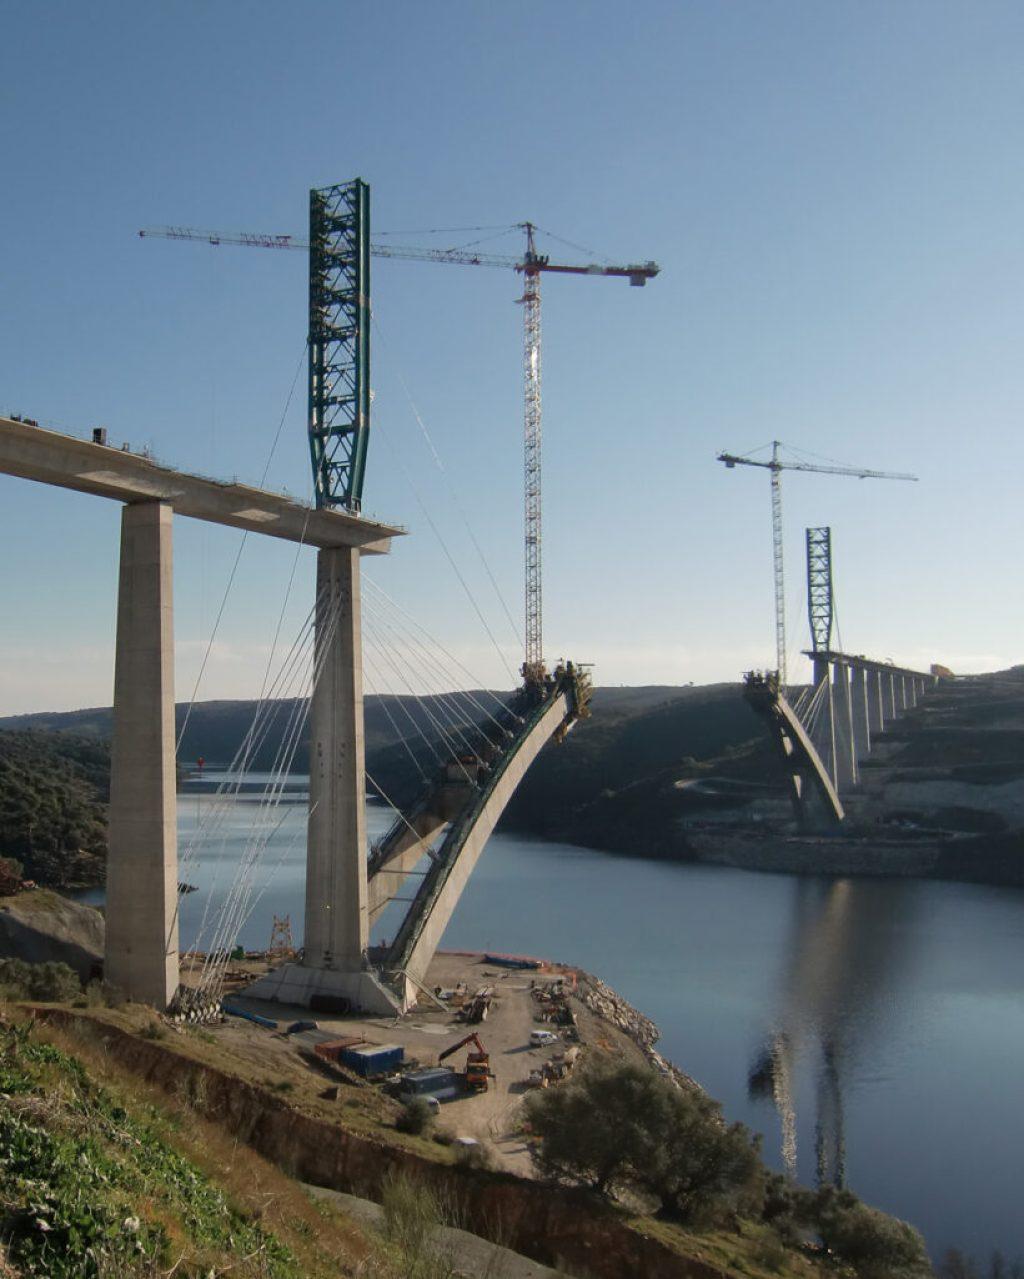 Viaduct Over River Almonte – Garrovillas de Alconétar, Cáceres, Extremadura, Spain. Credit: American Concrete Institute